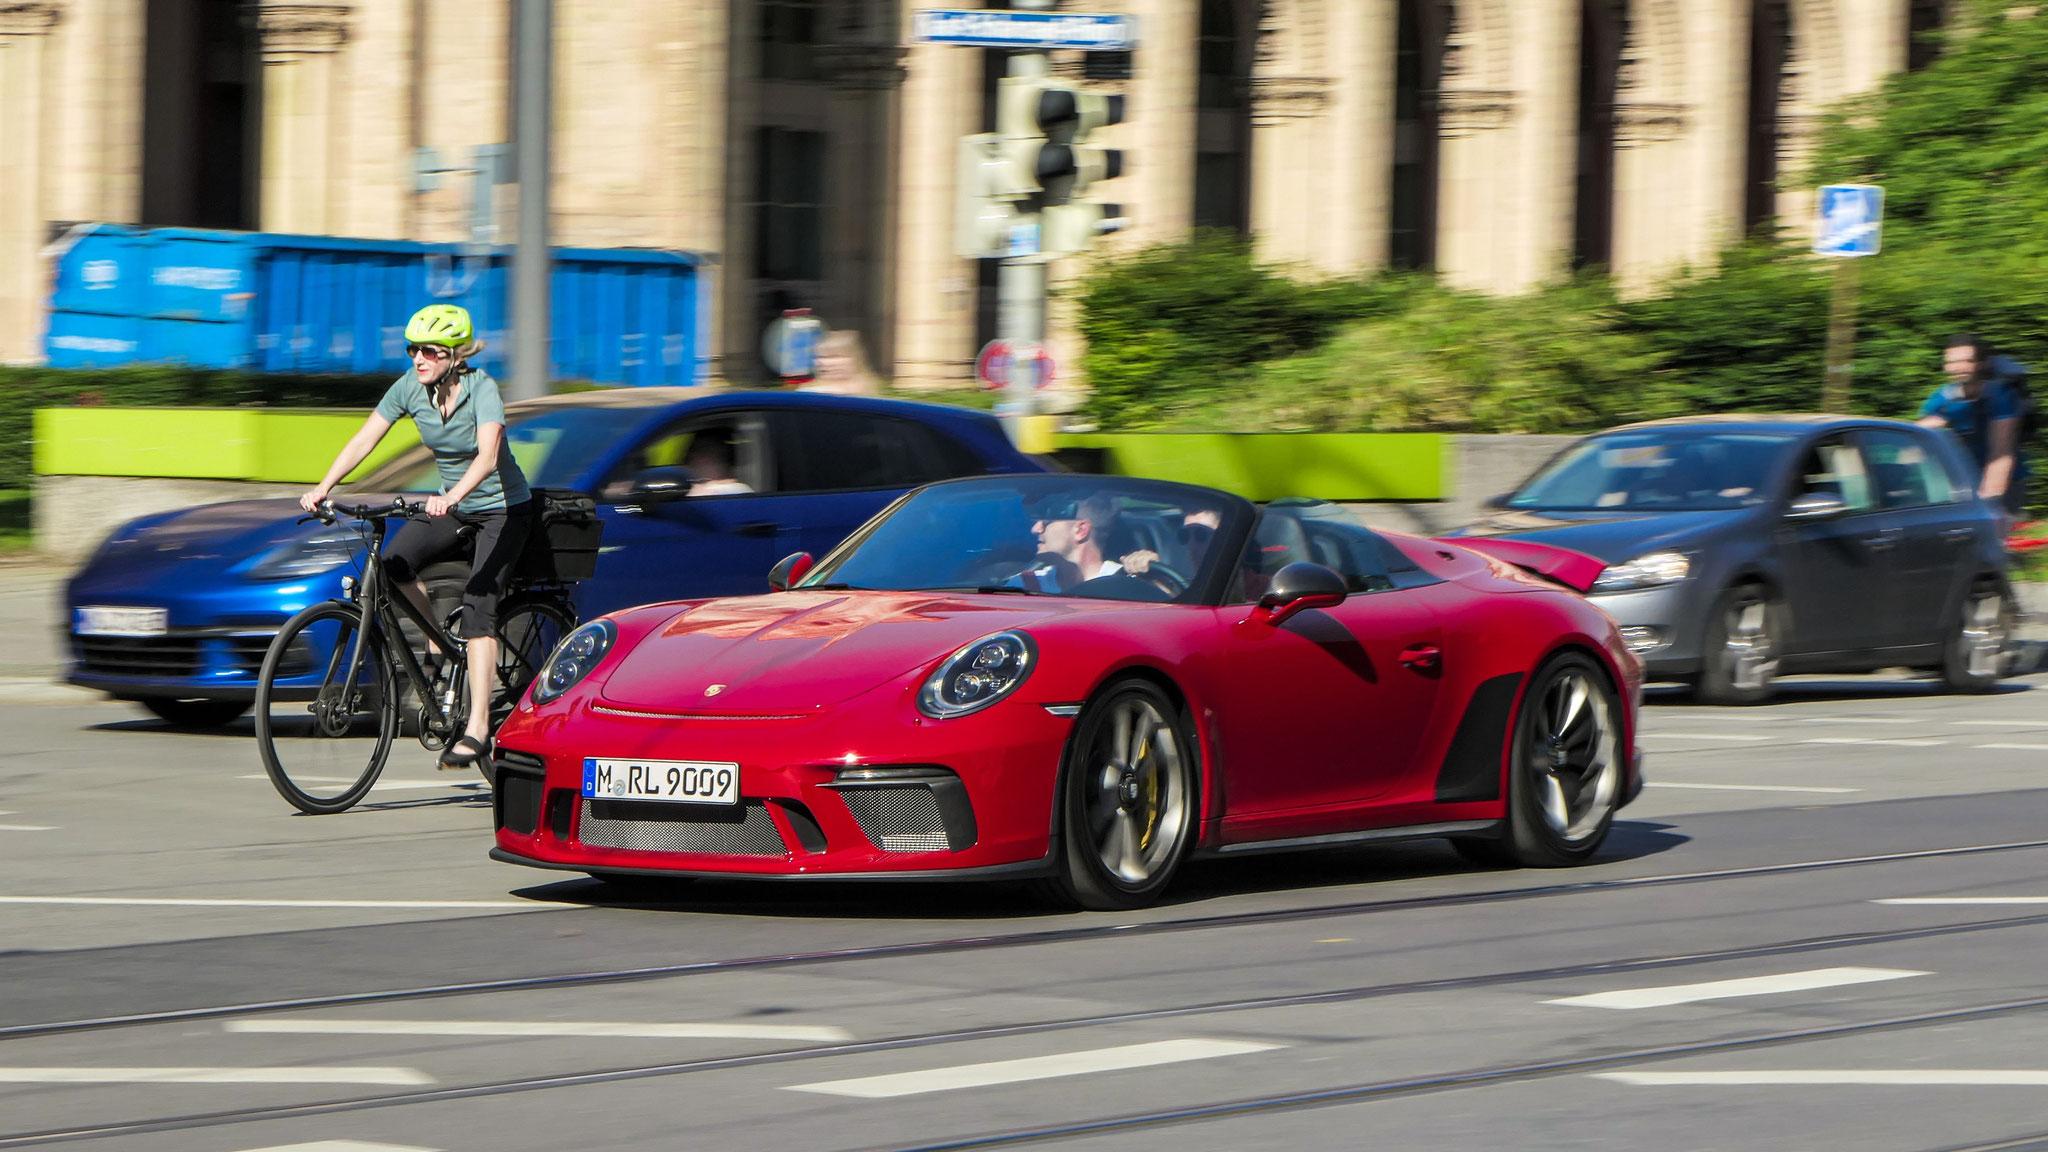 Porsche 991 Speedster - M-RL-9009